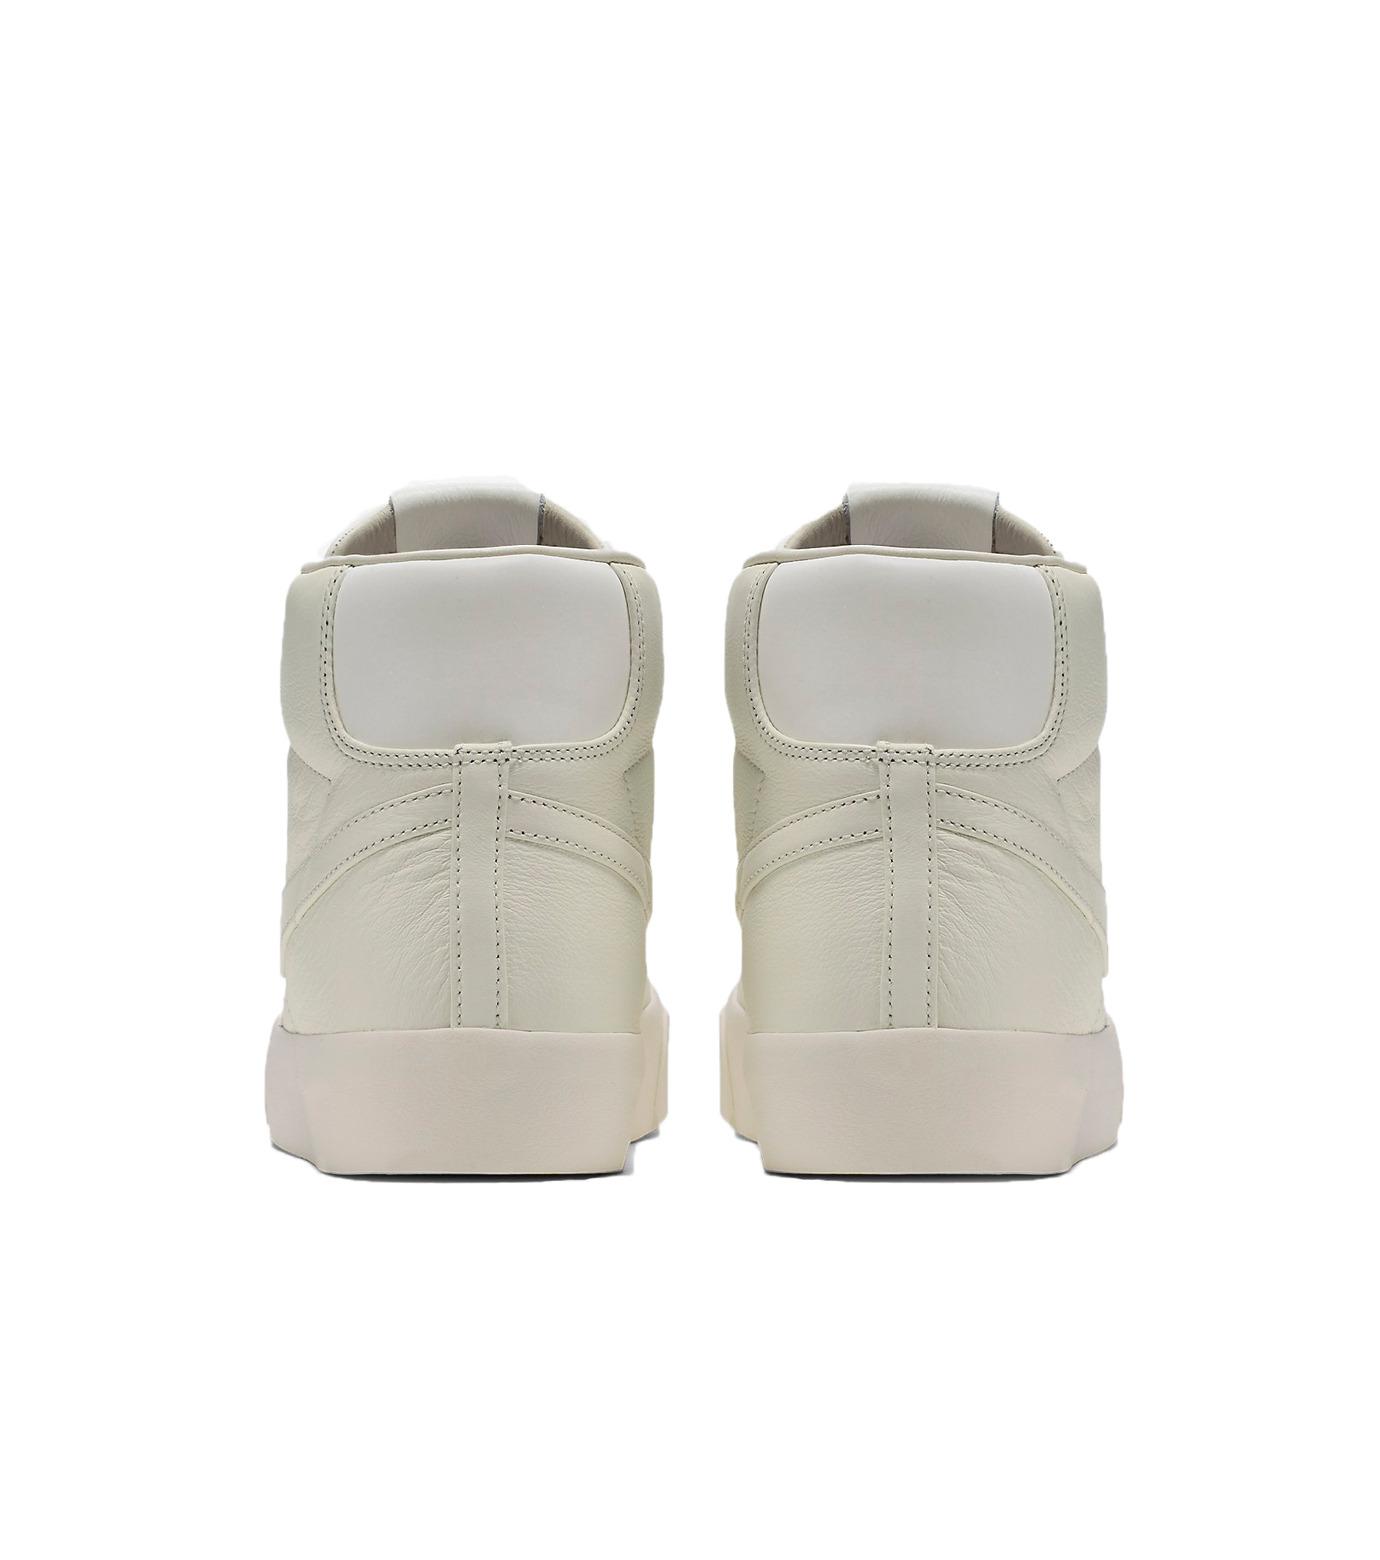 NIKE(ナイキ)のBLAZER STUDIO MID-WHITE(シューズ/shoes)-904805-100-4 拡大詳細画像6